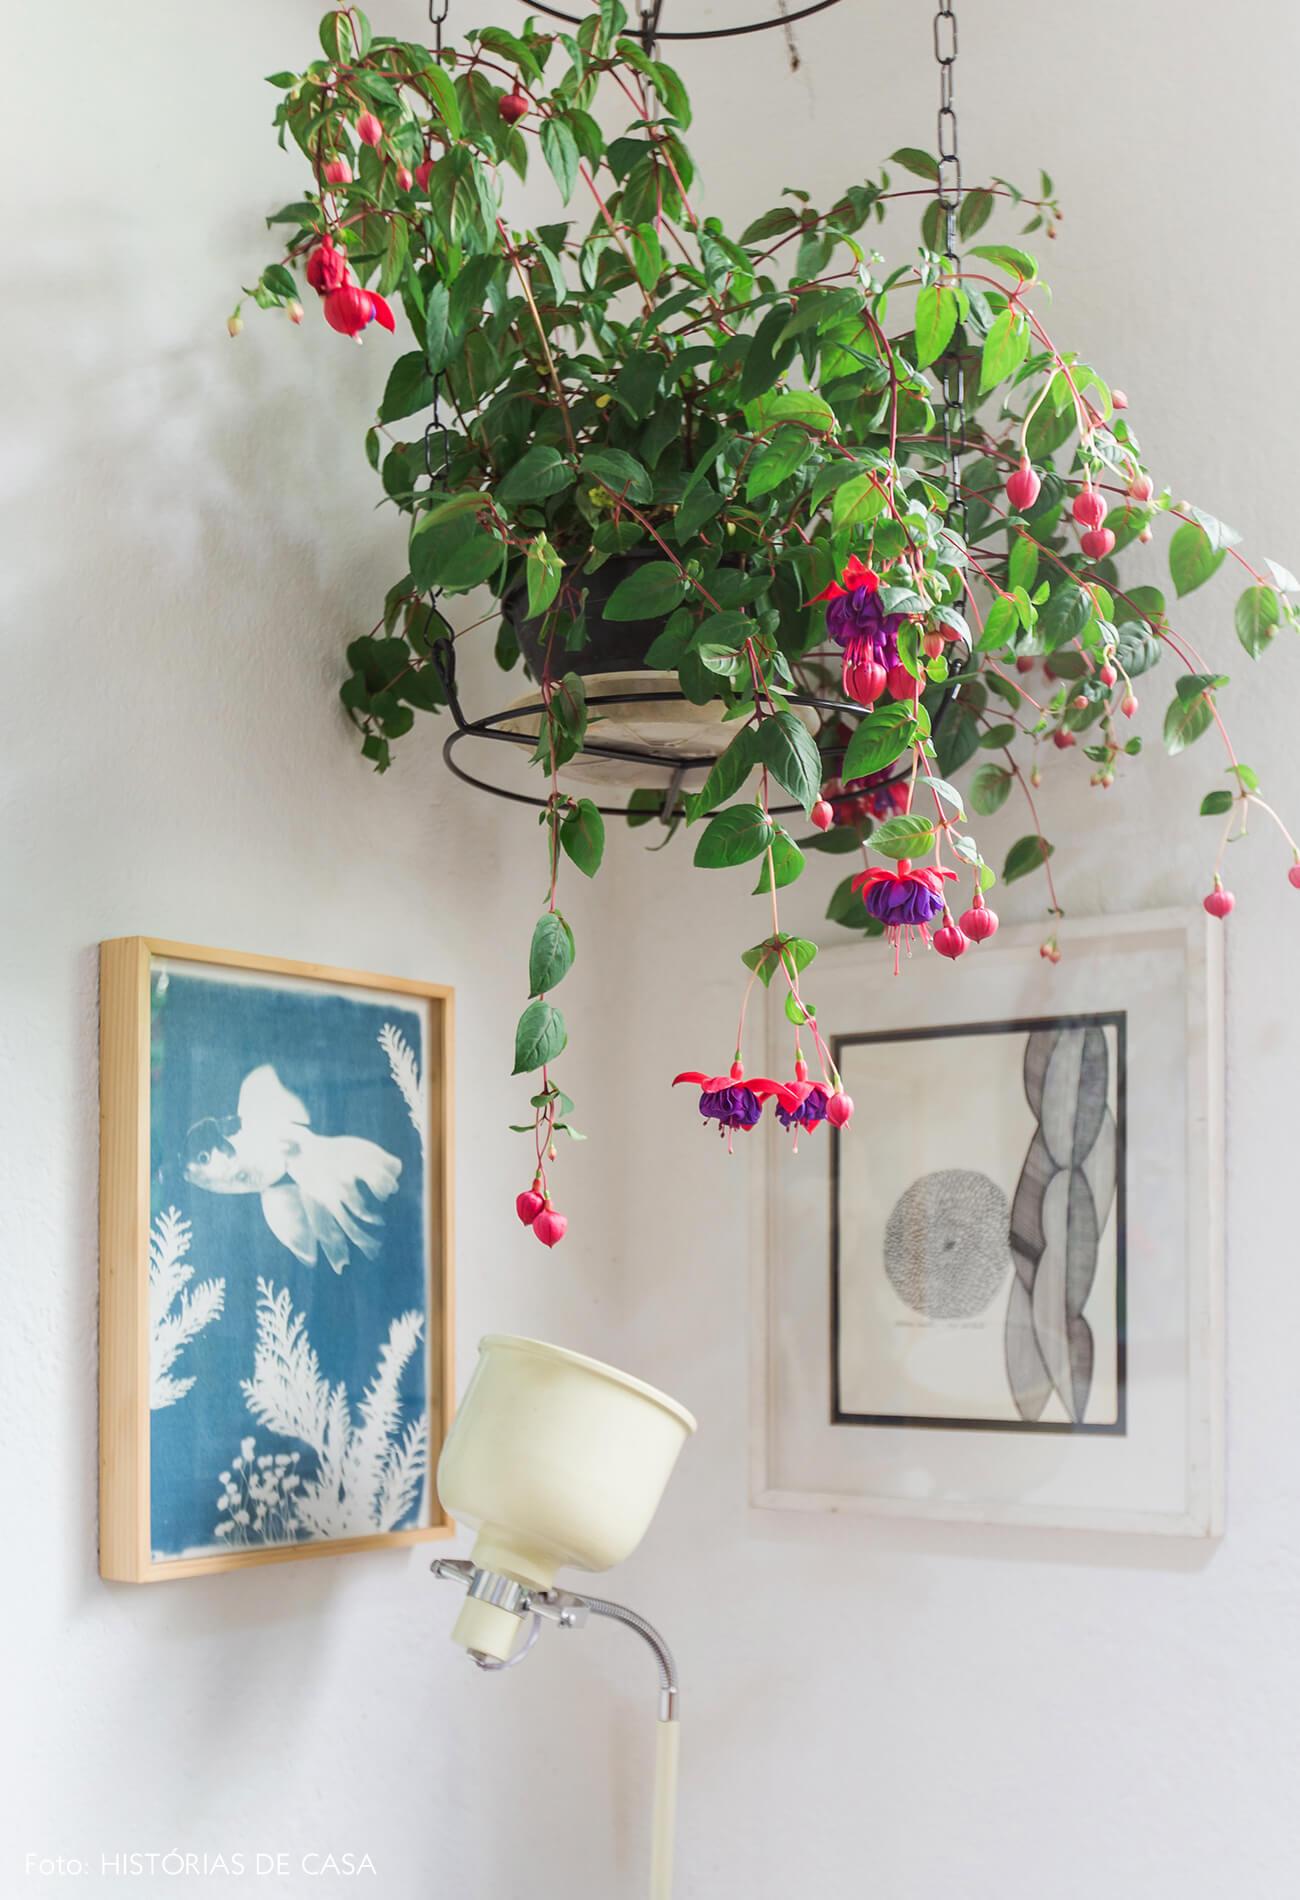 Planta suspensa e quadros coloridos